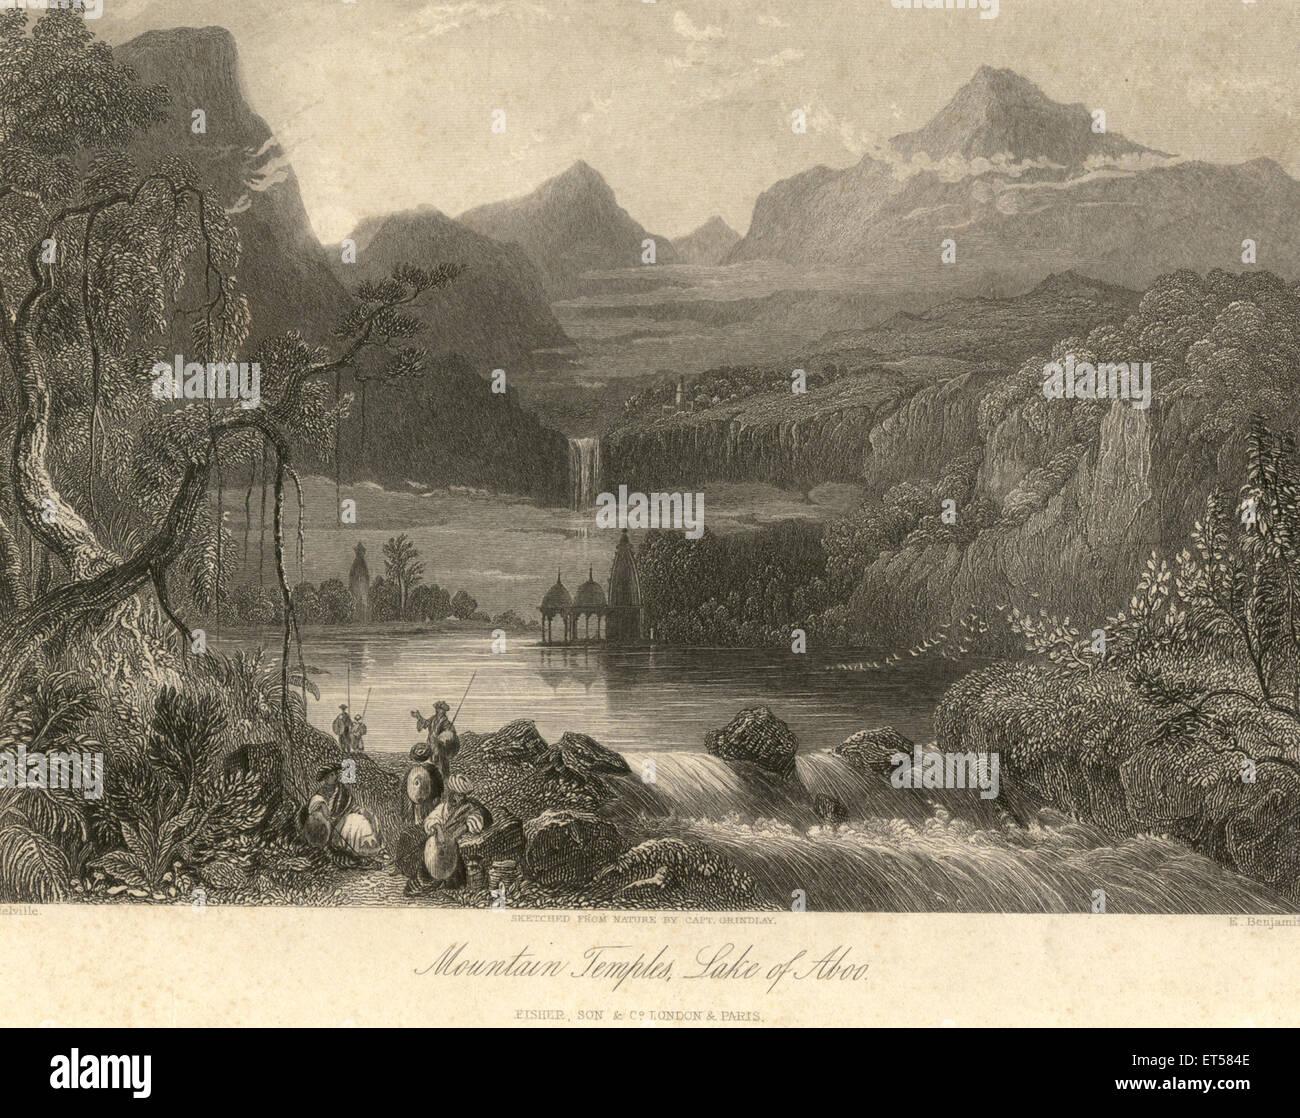 Mountain temples ; lake of Aboo ; Abu ; fisher & son C. London & Paris ; Rajasthan ; India - Stock Image